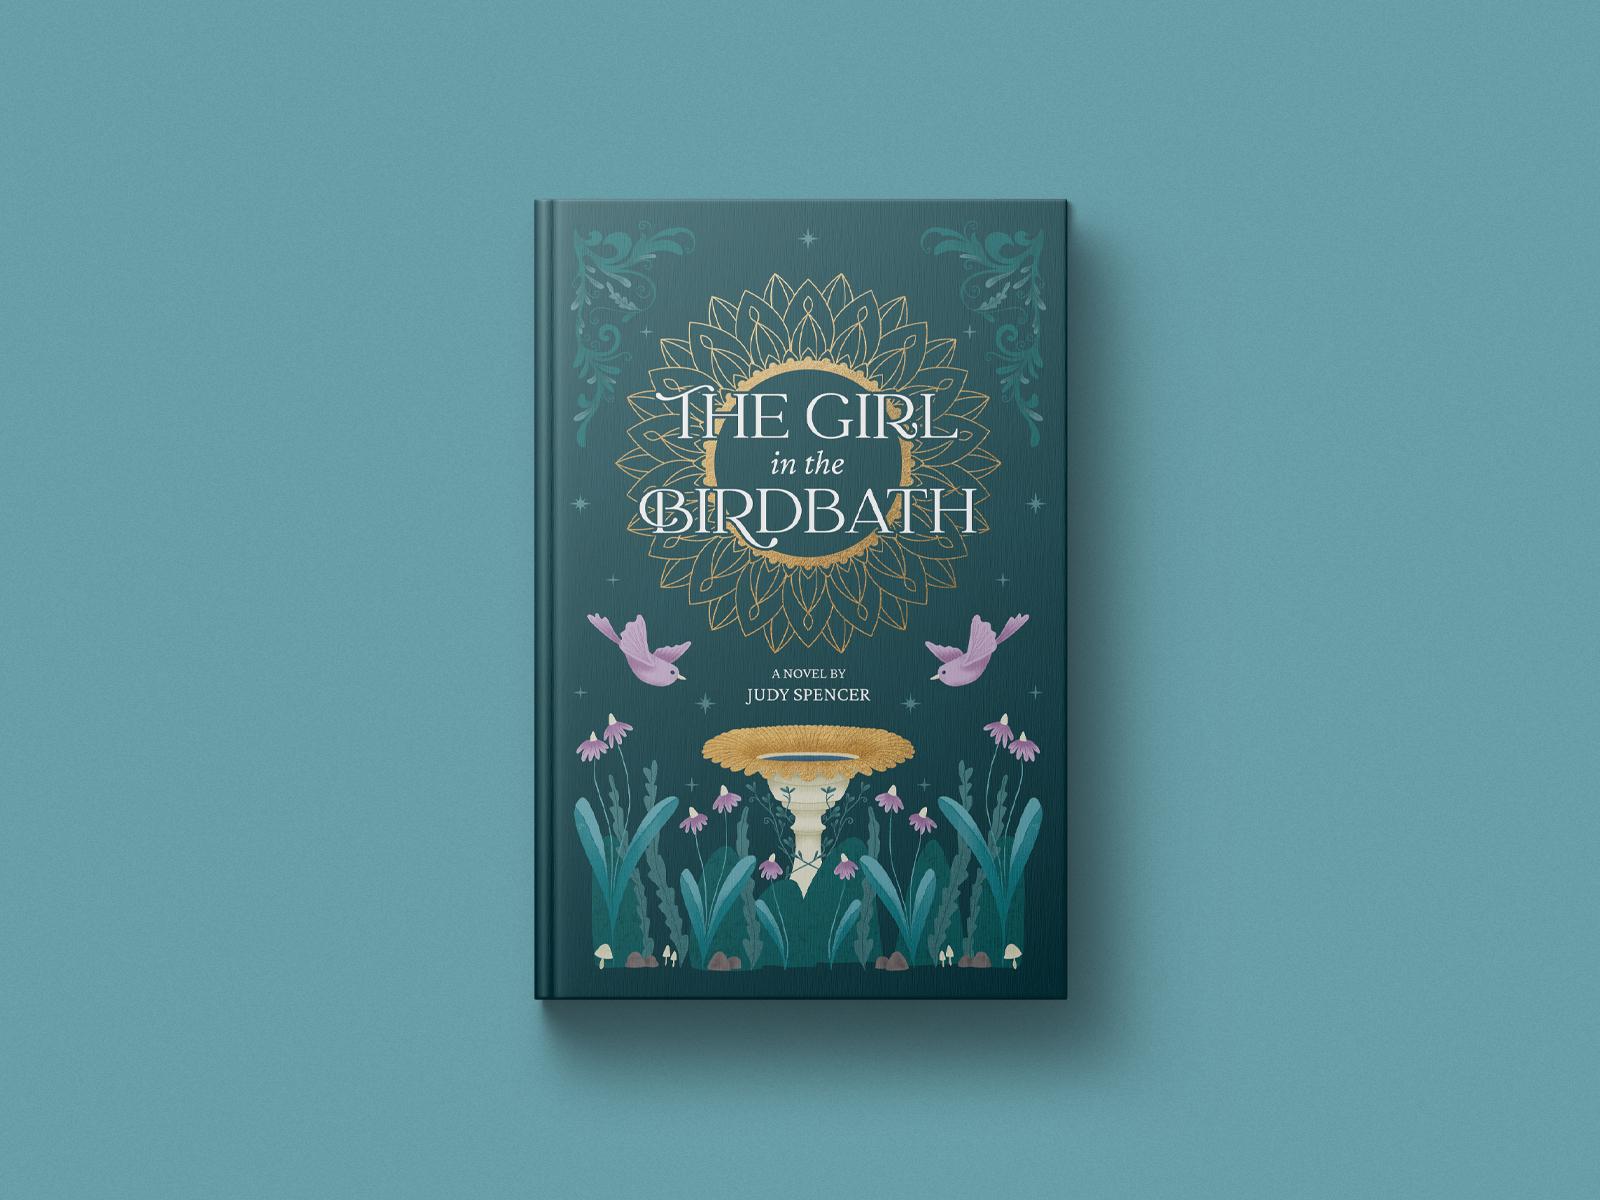 The Girl in the Birdbath cover